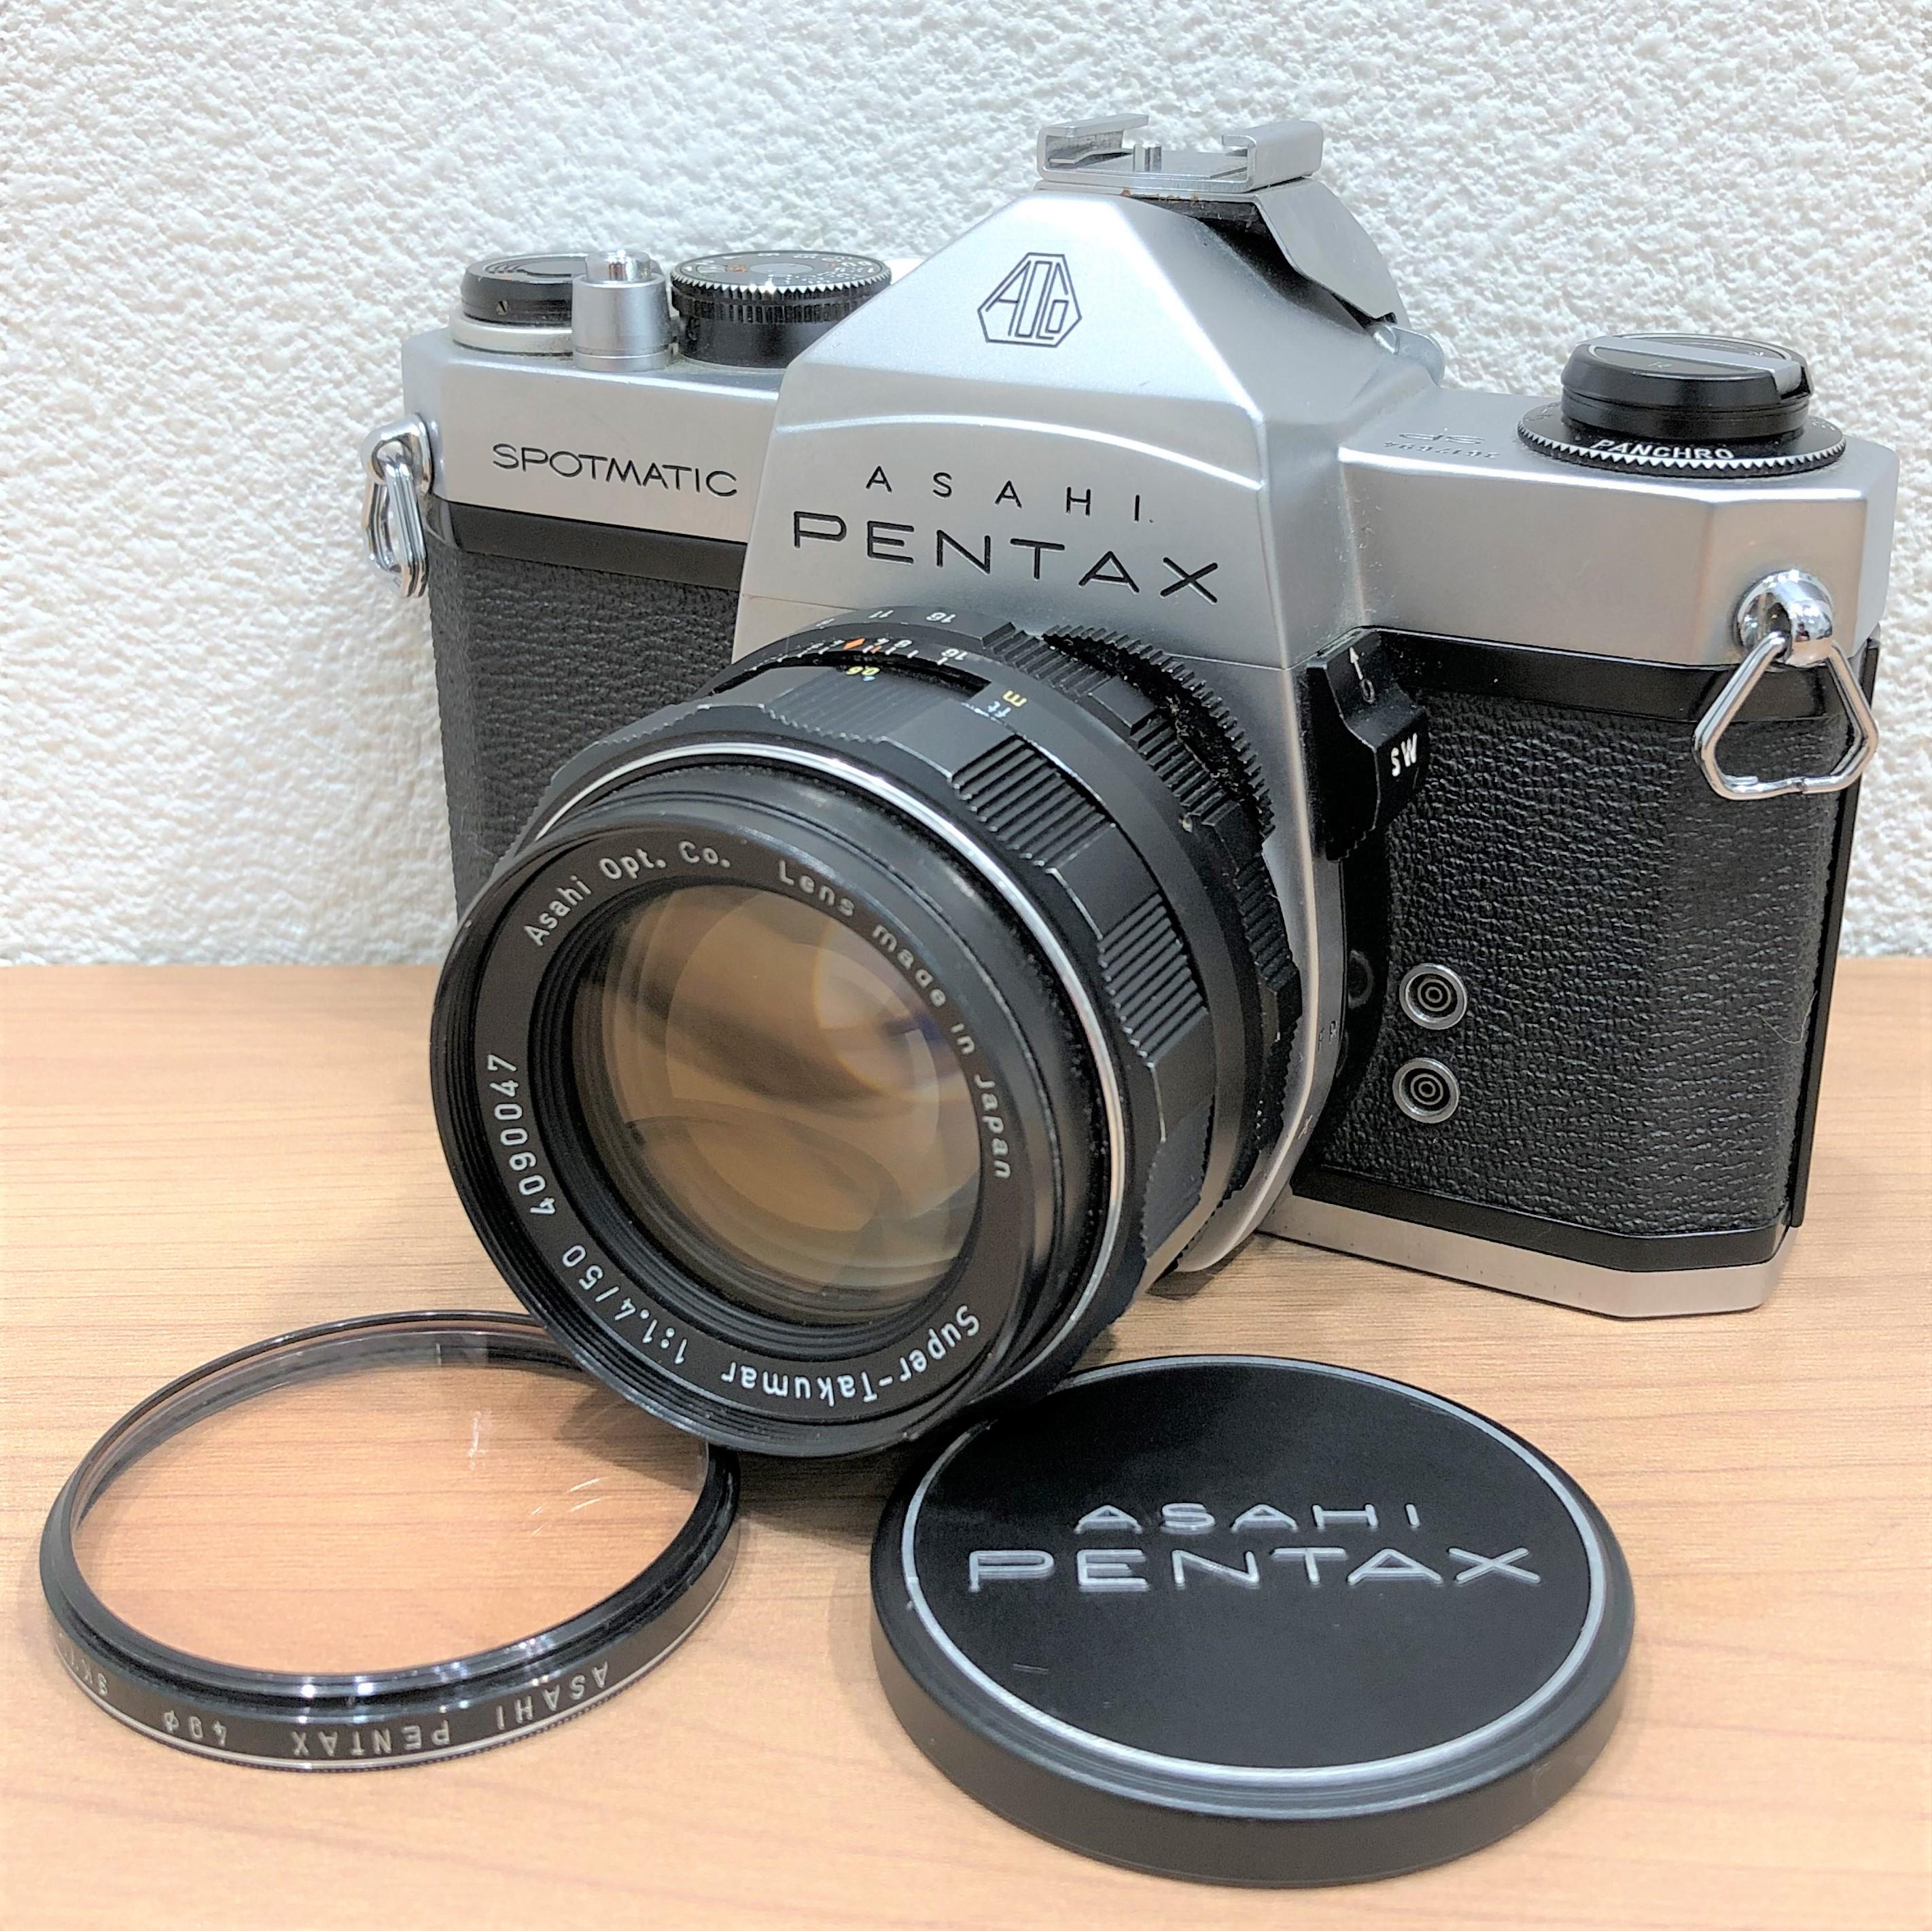 【ASAHI PENTAX//アサヒペンタックス】スポーツマチック スーパータクマー 一眼レフフィルムカメラ